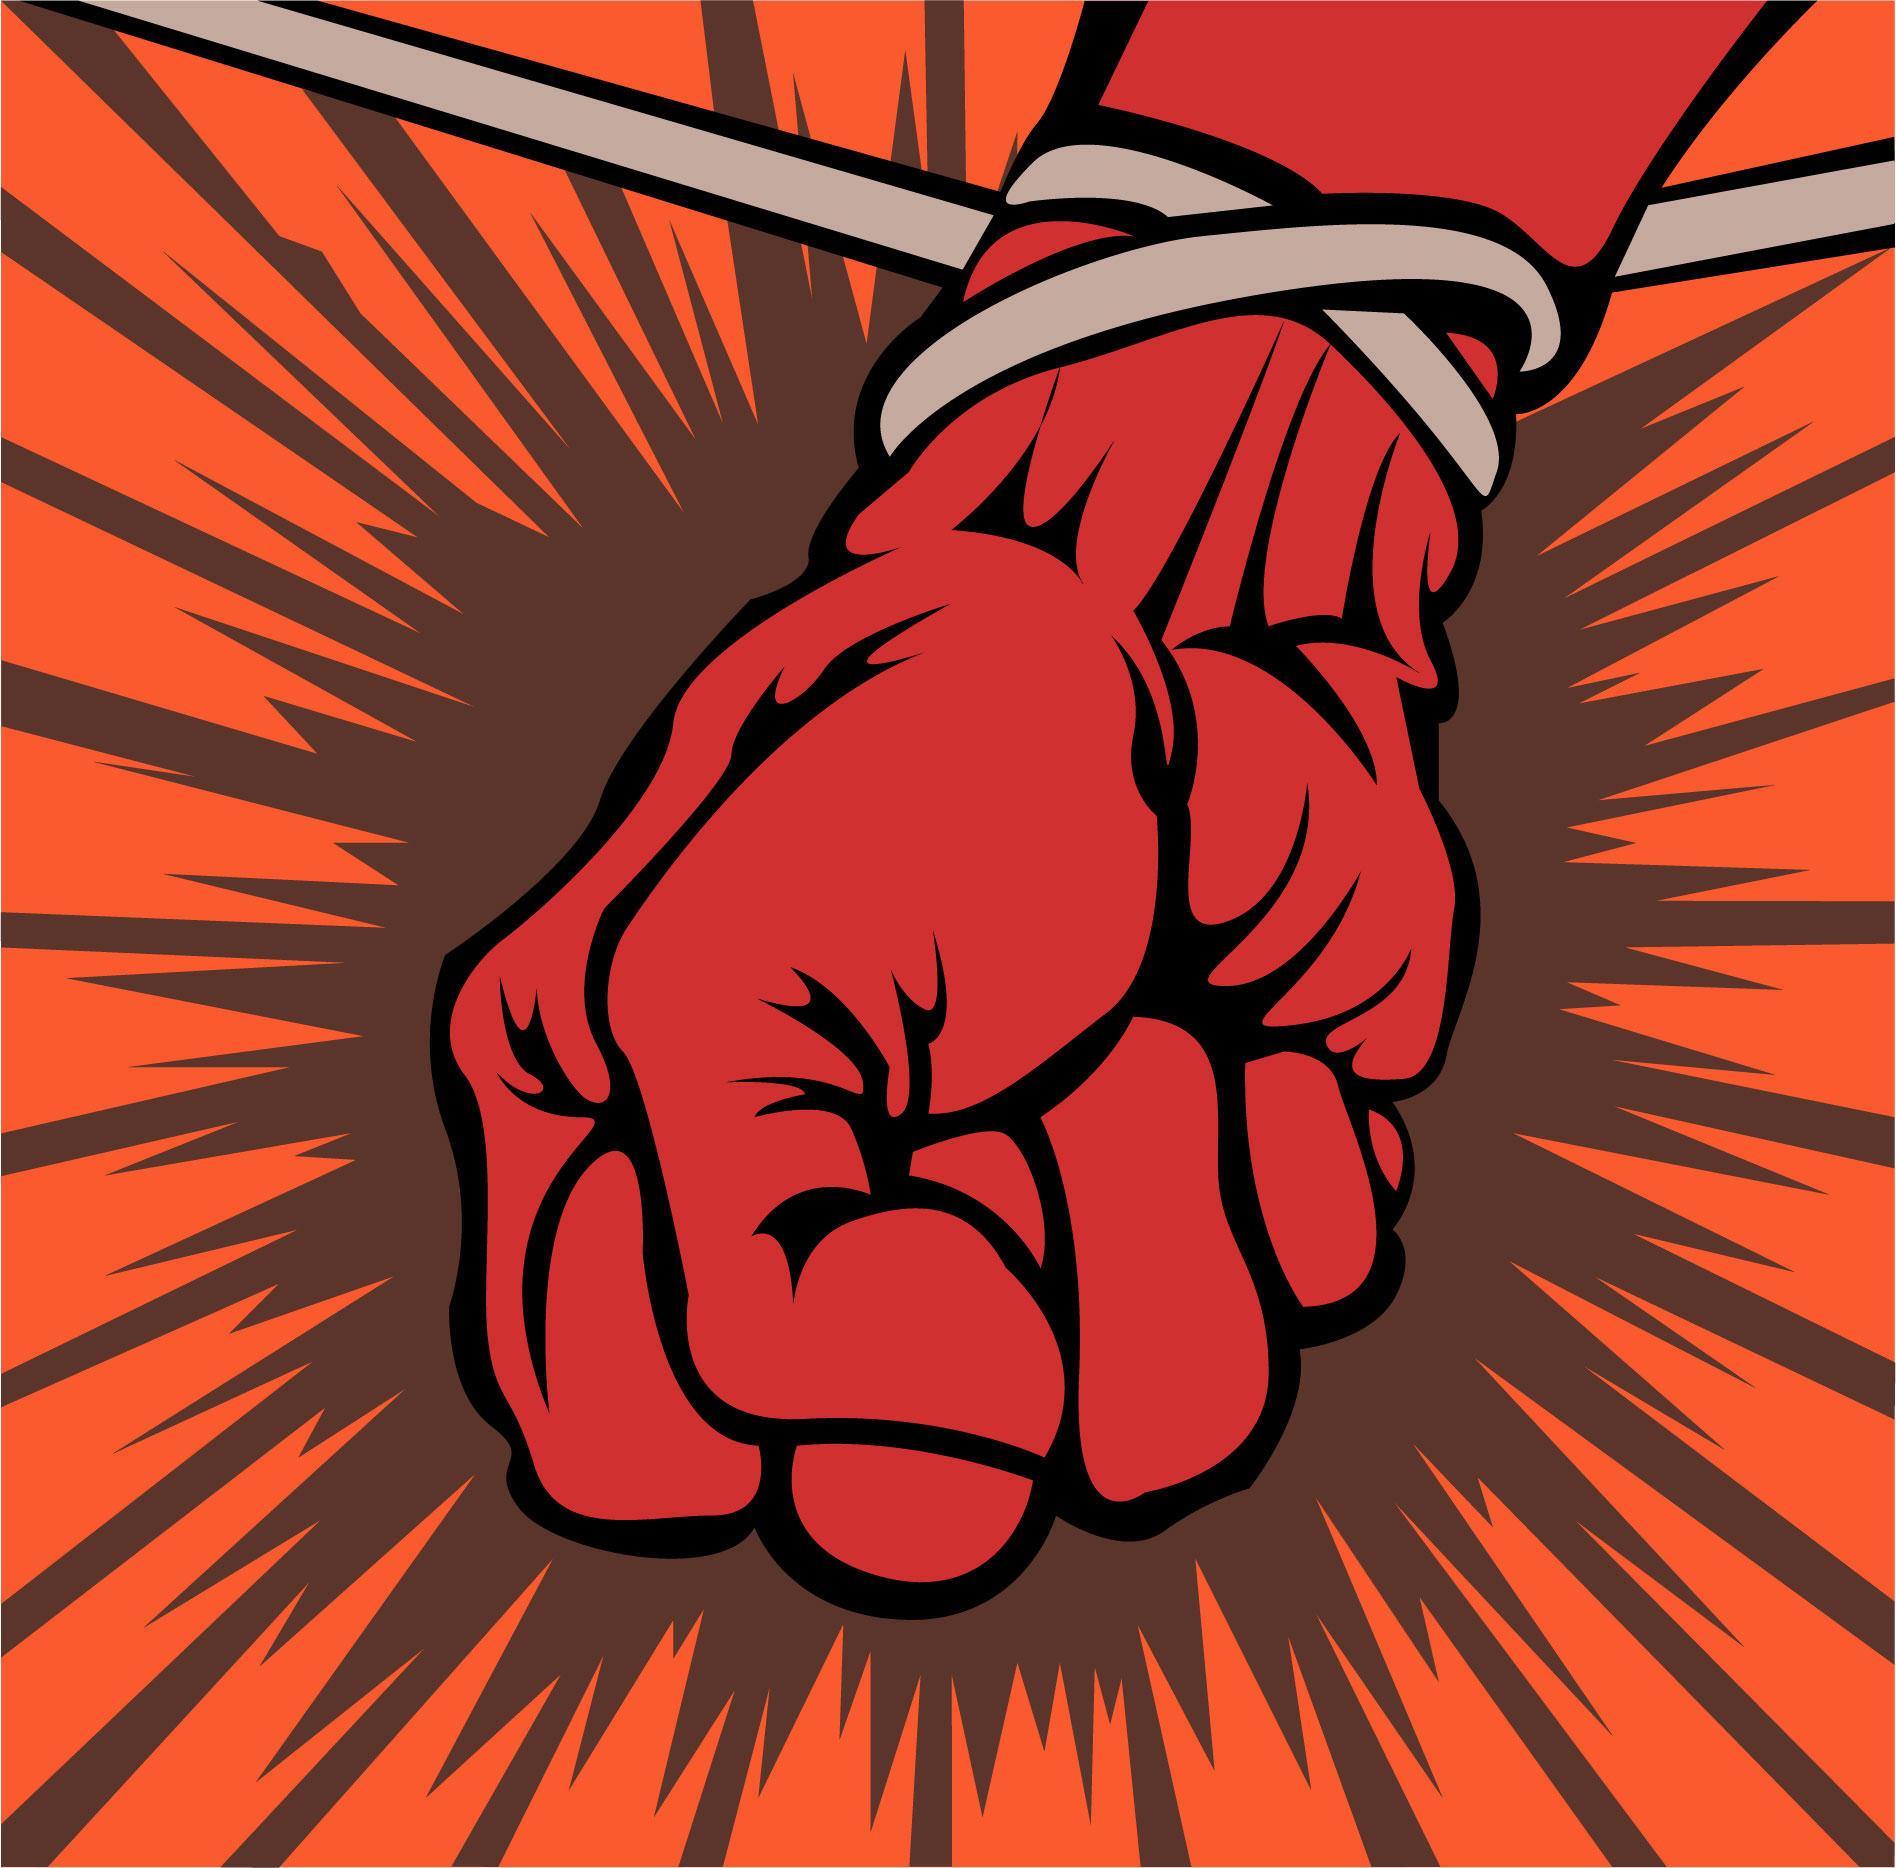 Black And Red Wallpaper Hd St Anger By Pixelnemesis On Deviantart